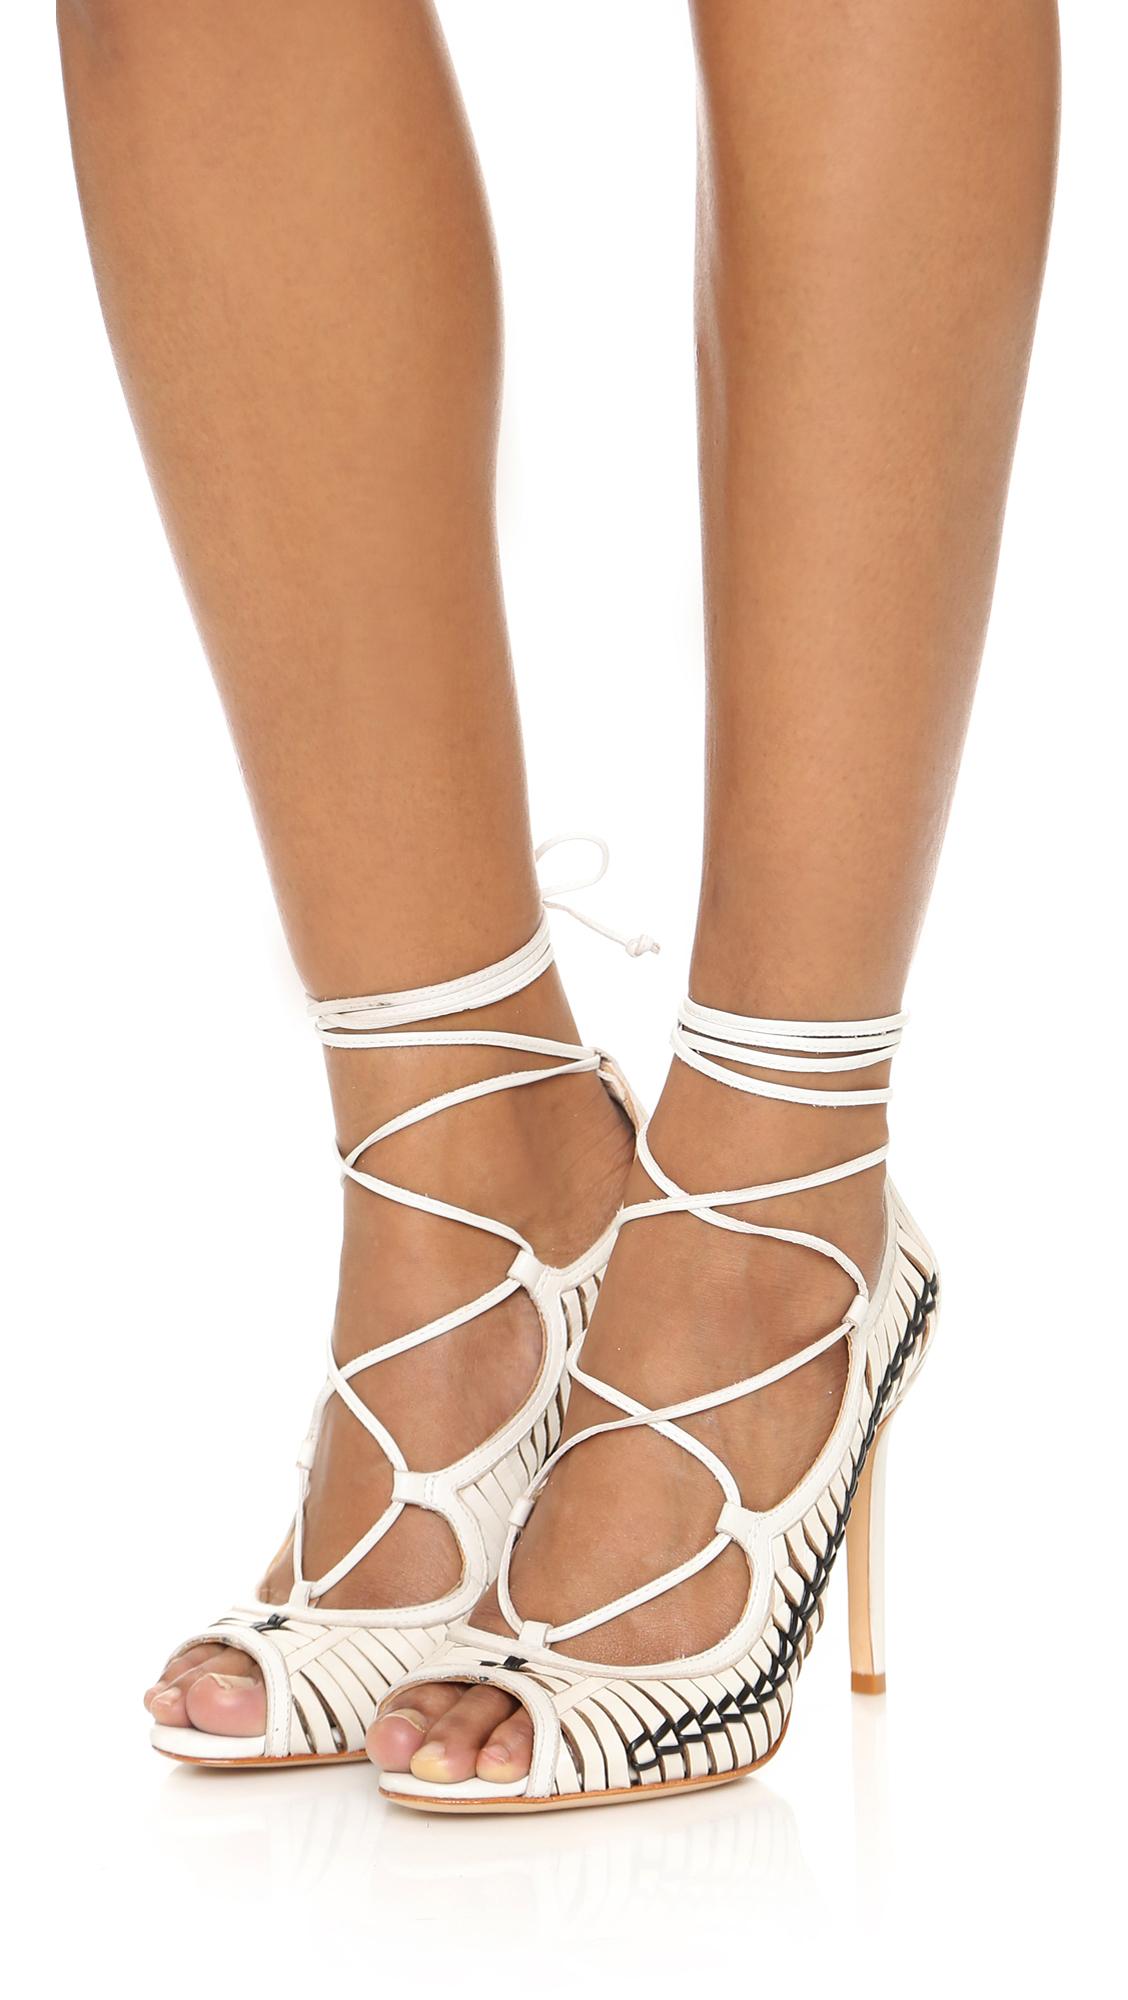 4fb451f758f Lyst - Schutz Mattie Lace Up Sandals - Pearl black in White